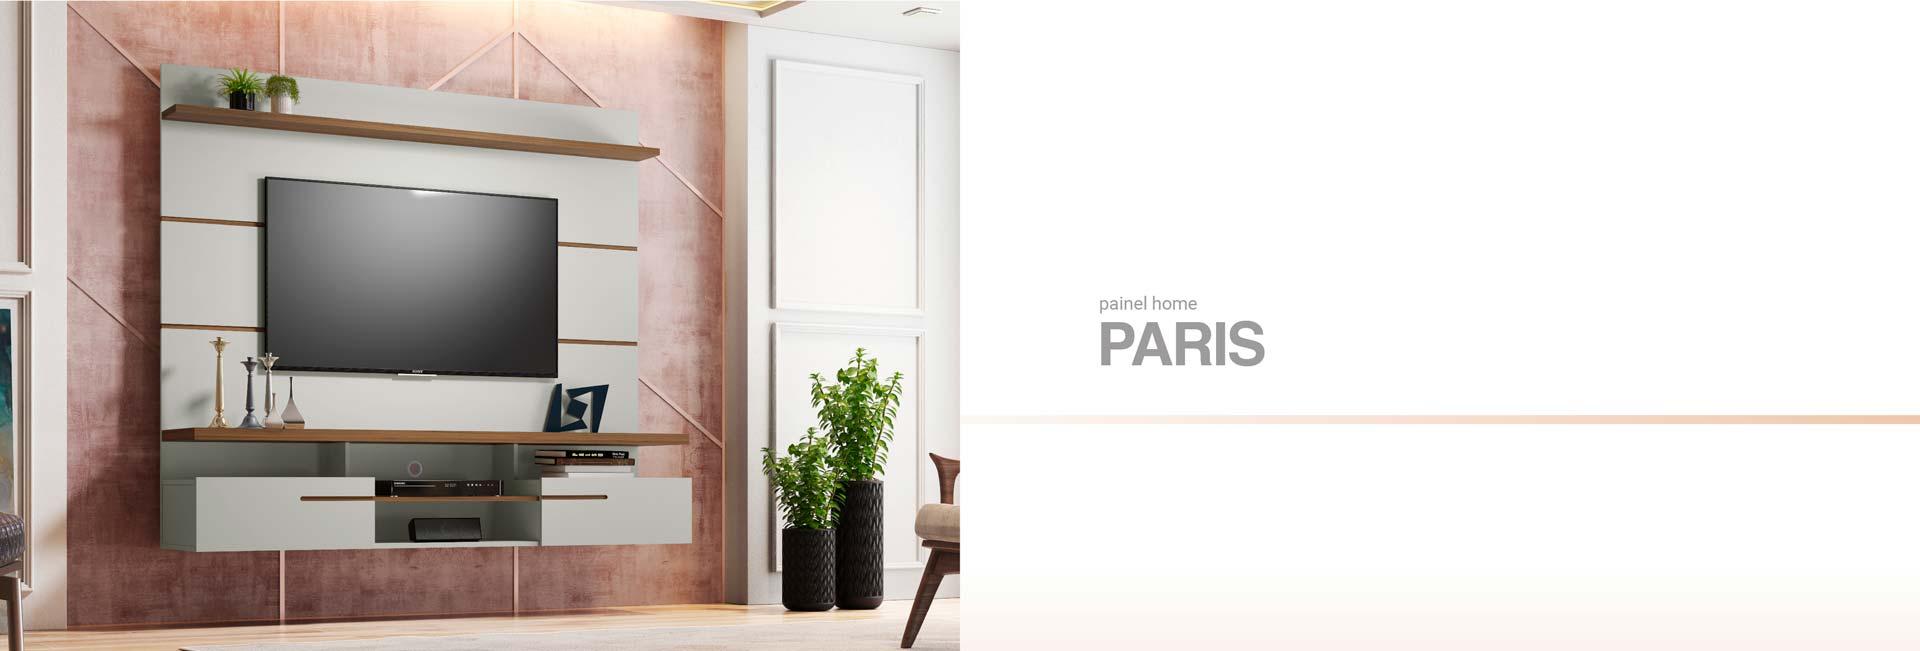 Painel para TV Paris